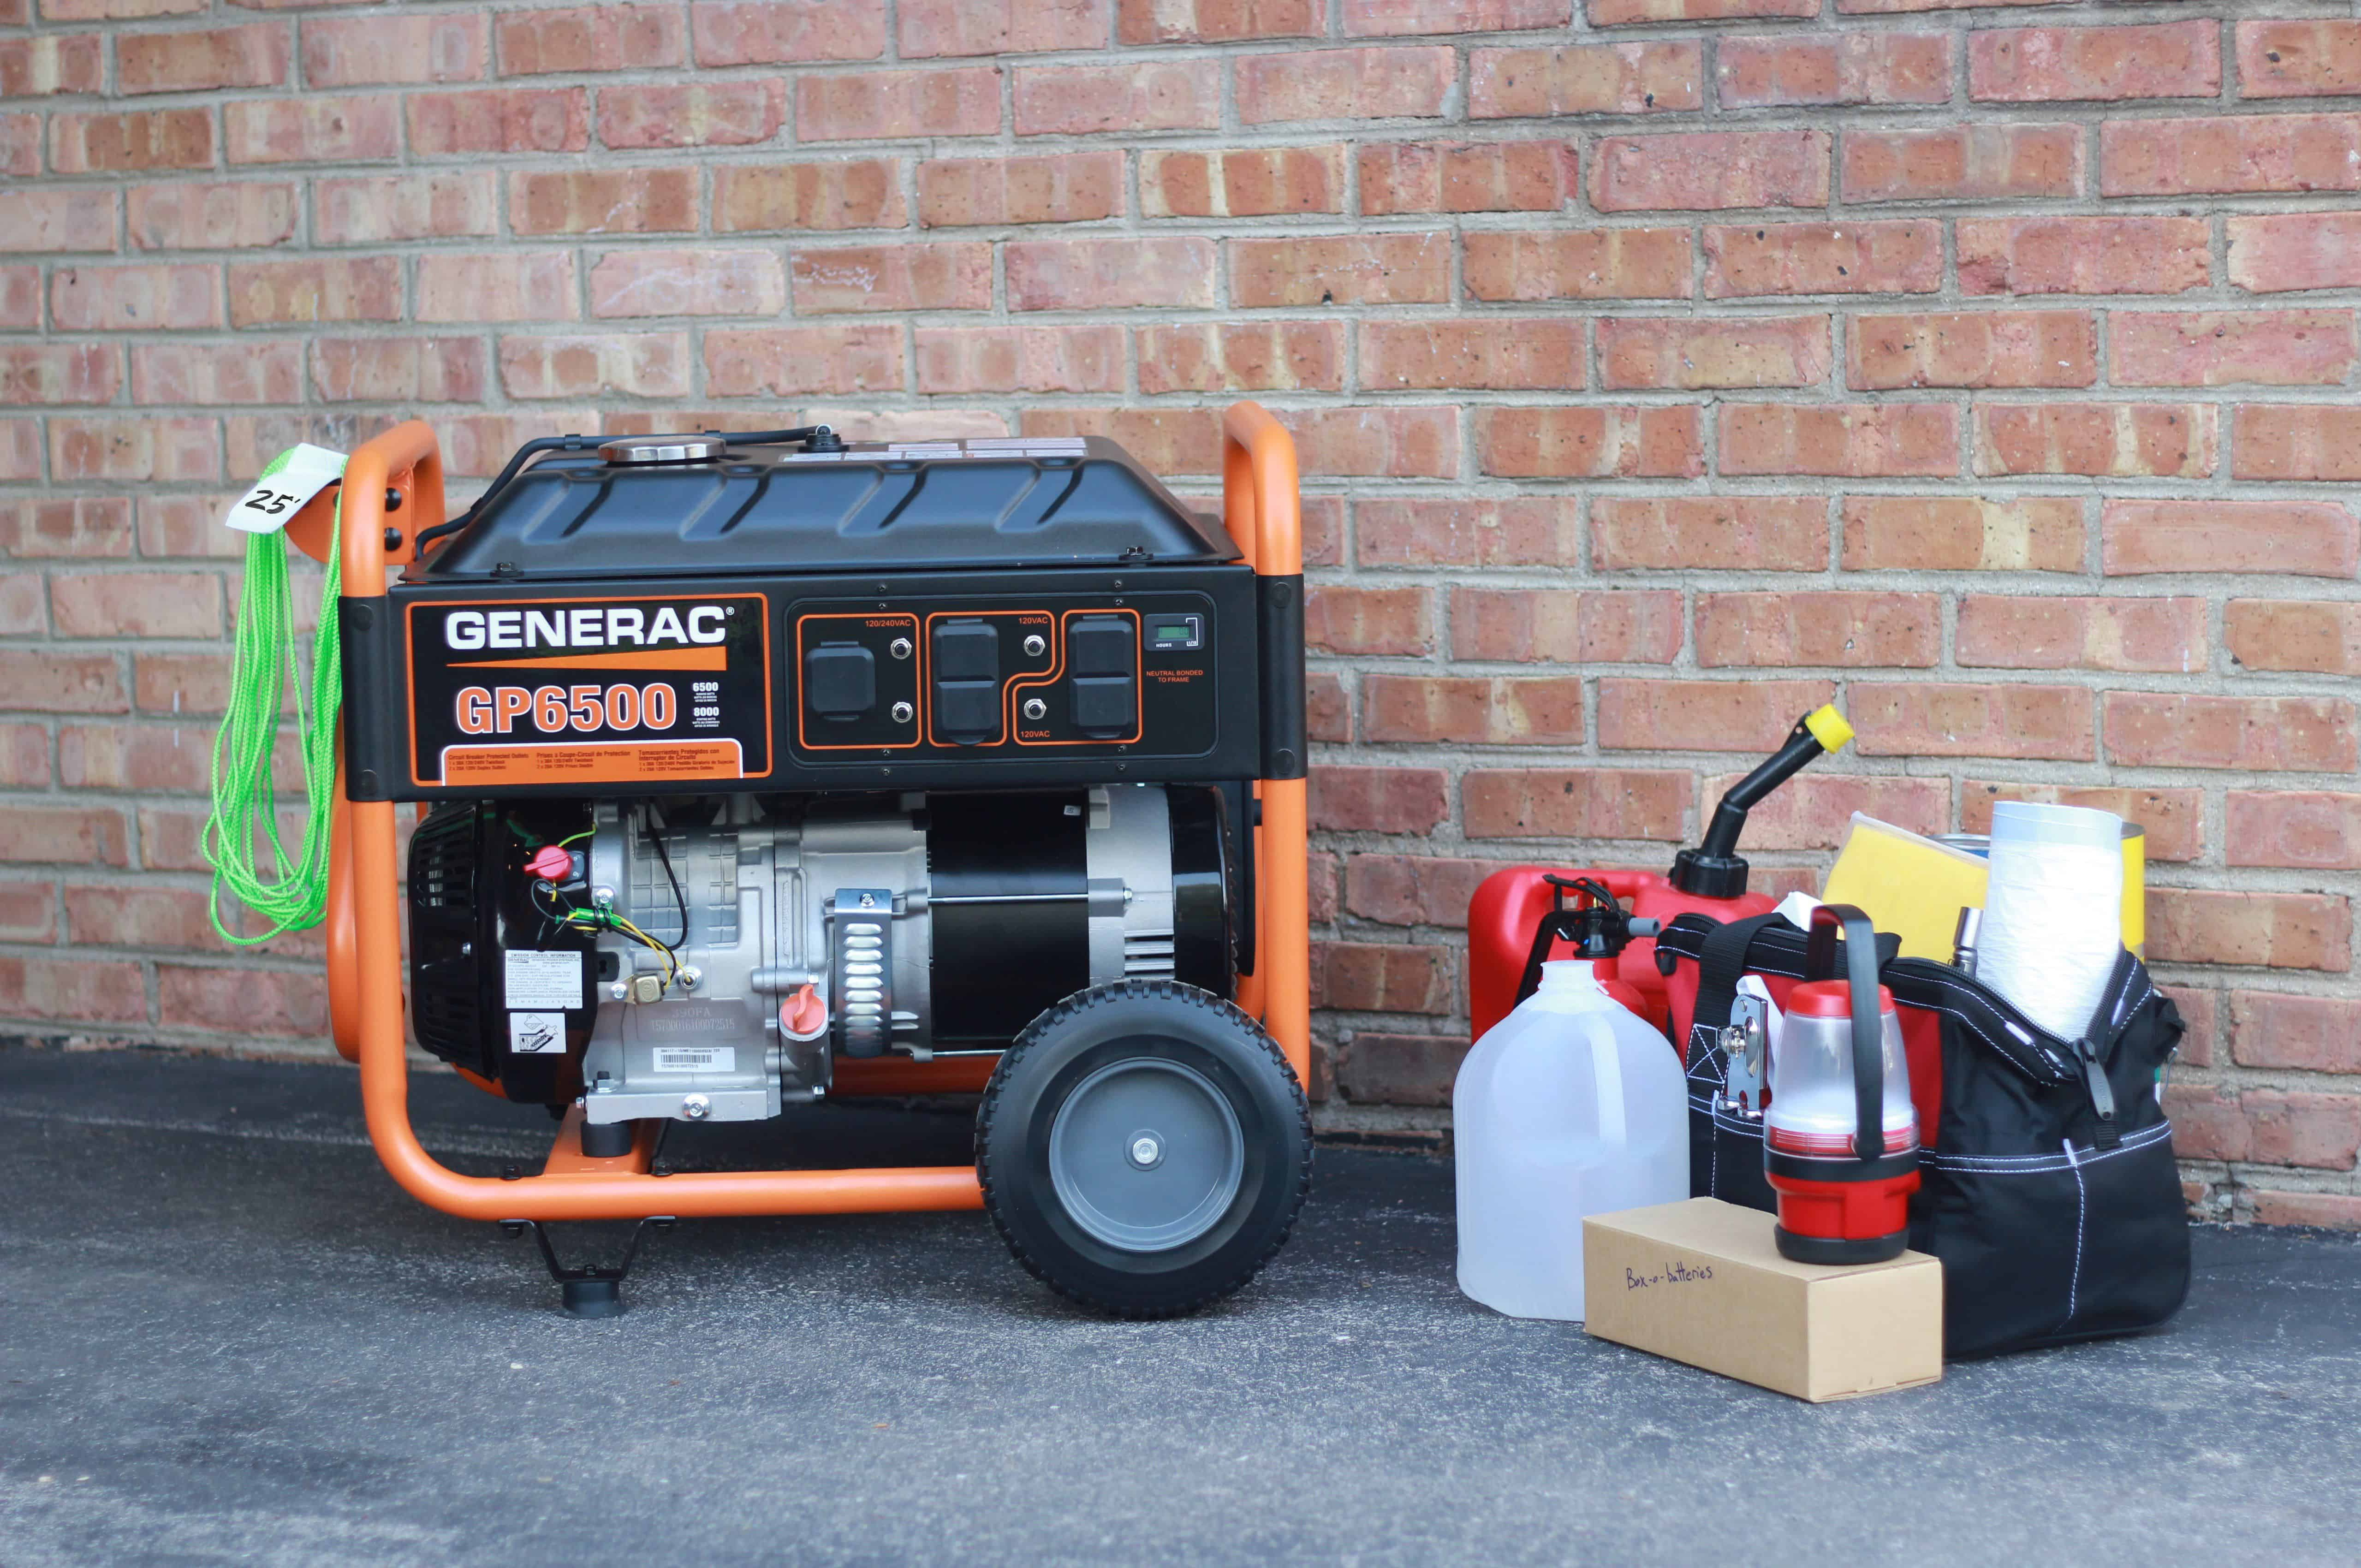 Generac Potable Generator Outage Kit